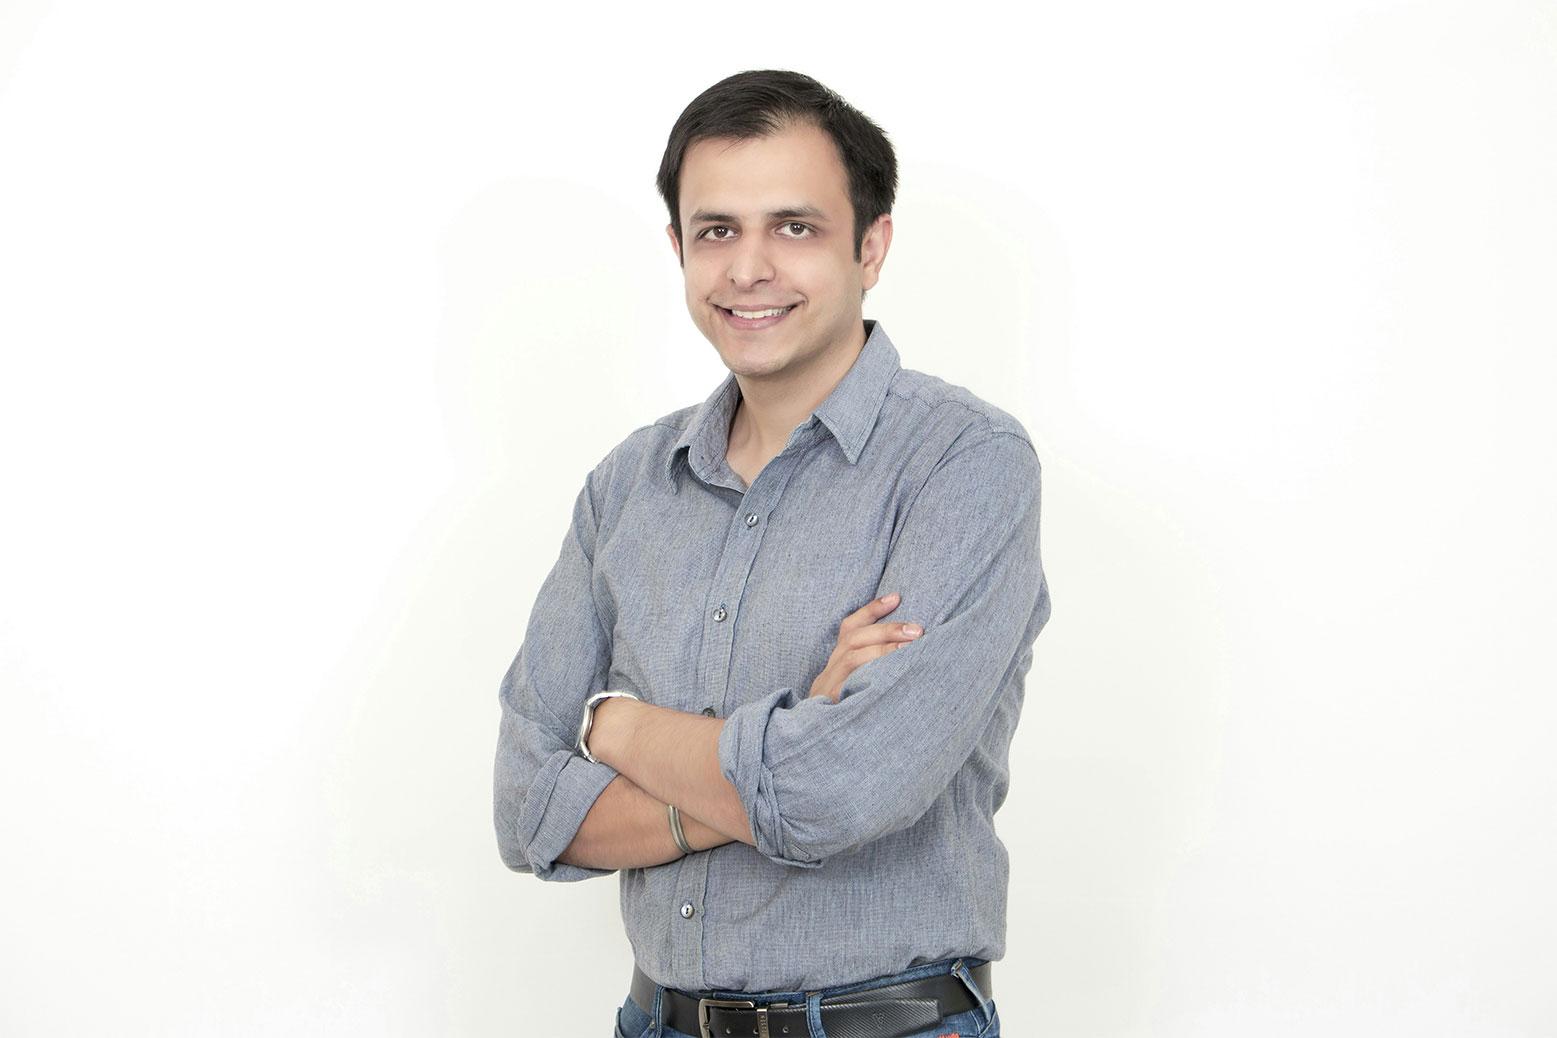 Cuemath Founder Manan Khurma